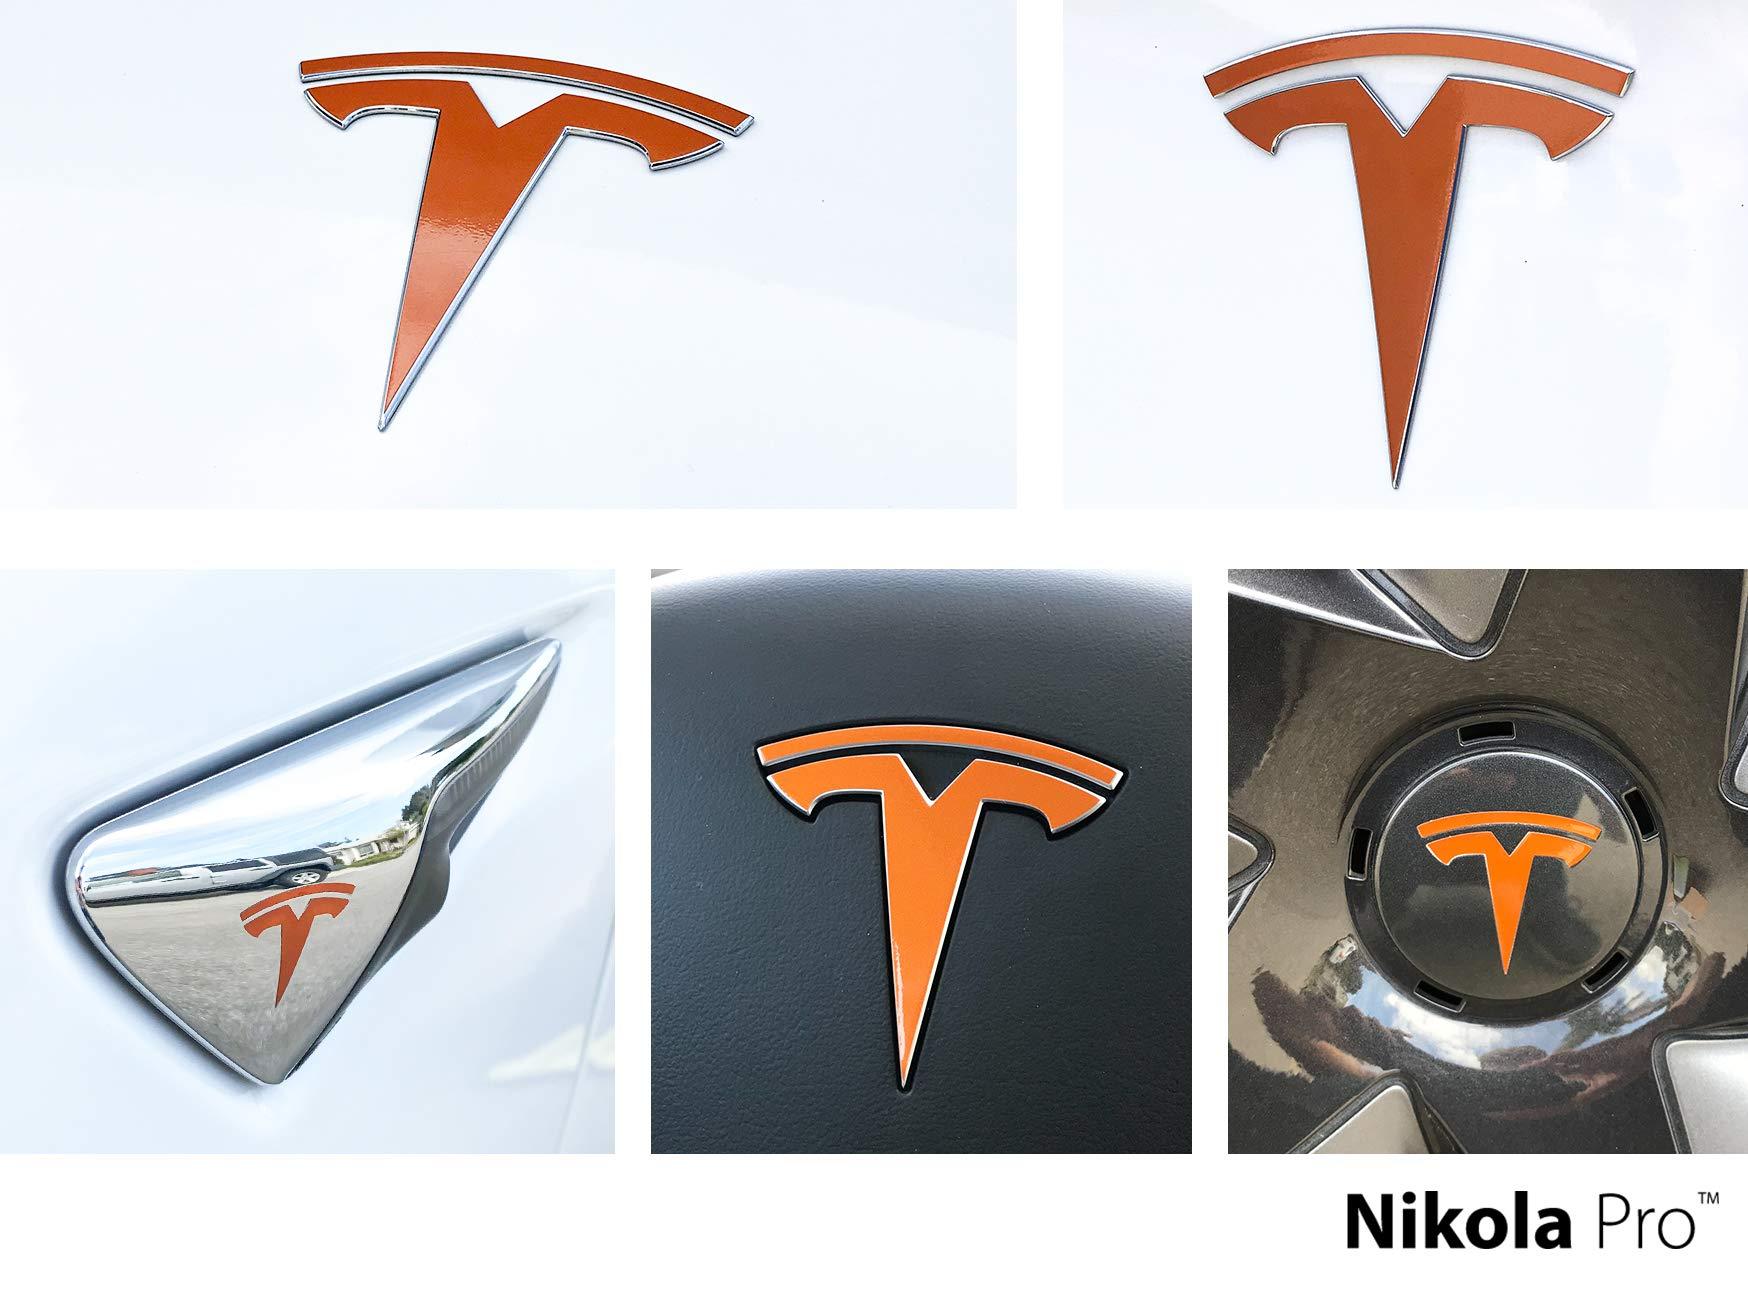 Nikola Pro Tesla Model 3 Logo Decal Wrap Kit (Gloss Orange)